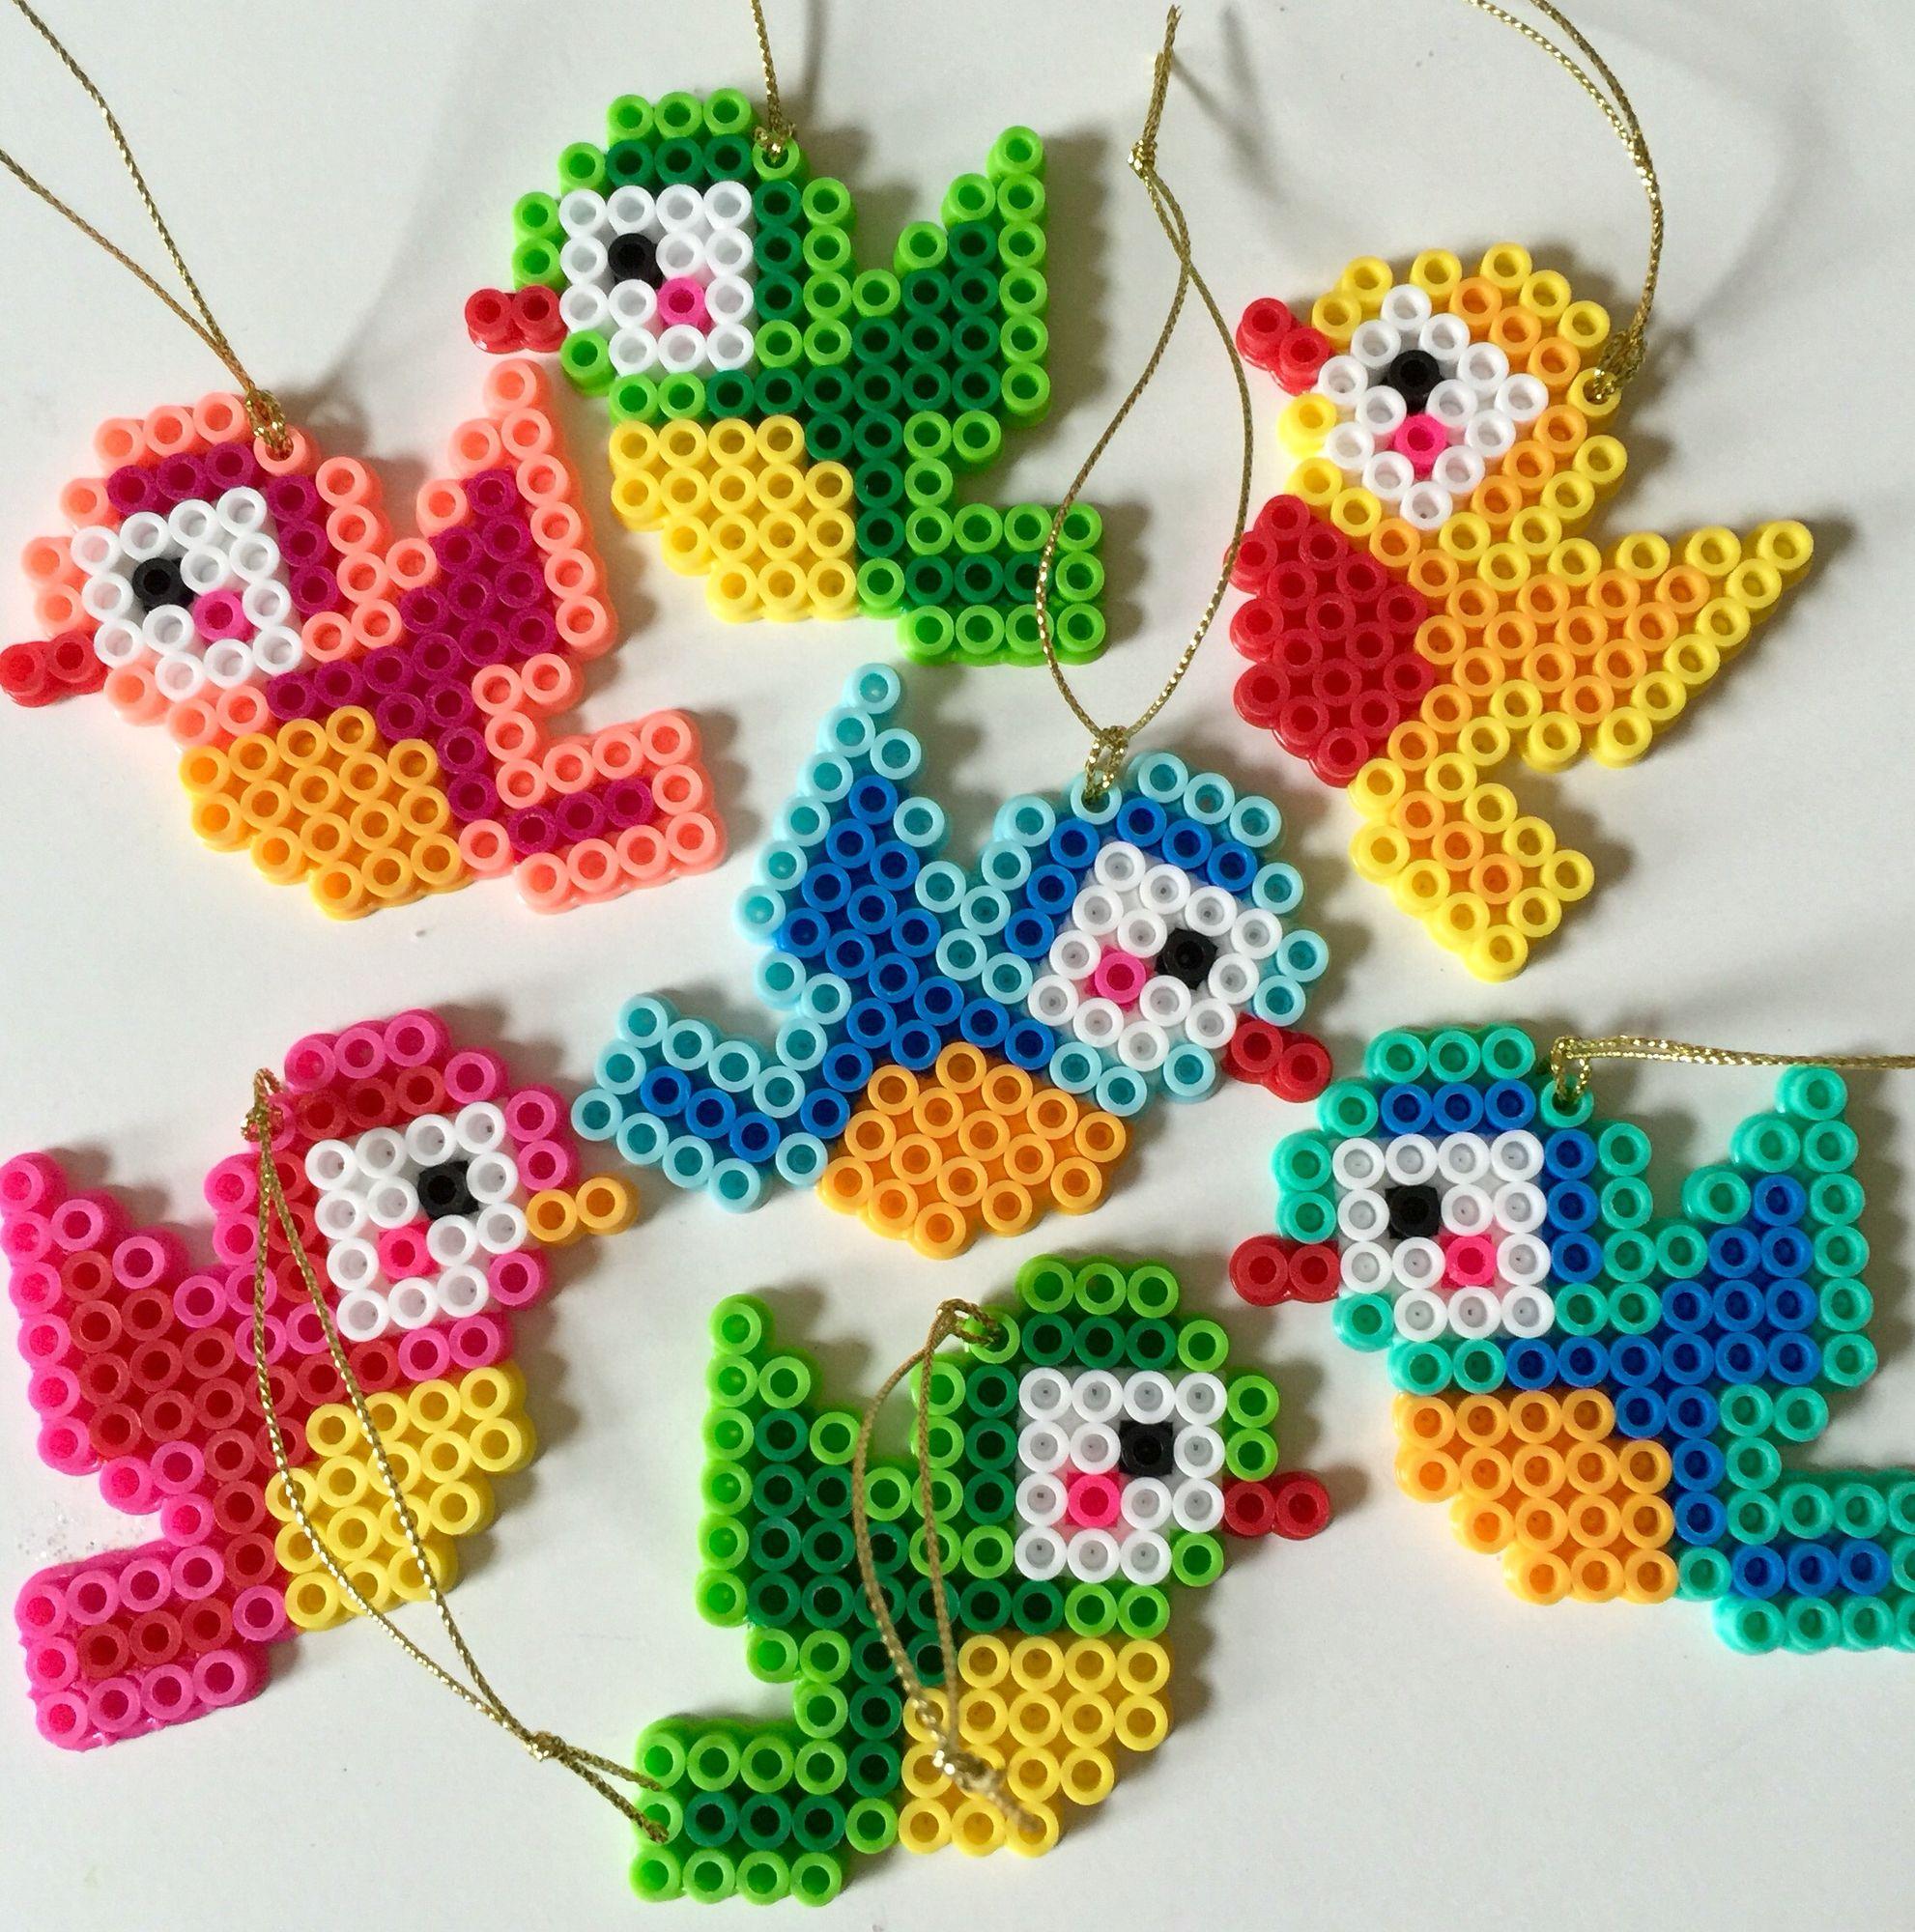 Perler Beads Bird Christmas Ornaments Easy Perler Bead Patterns Perler Beads Designs Perler Bead Templates